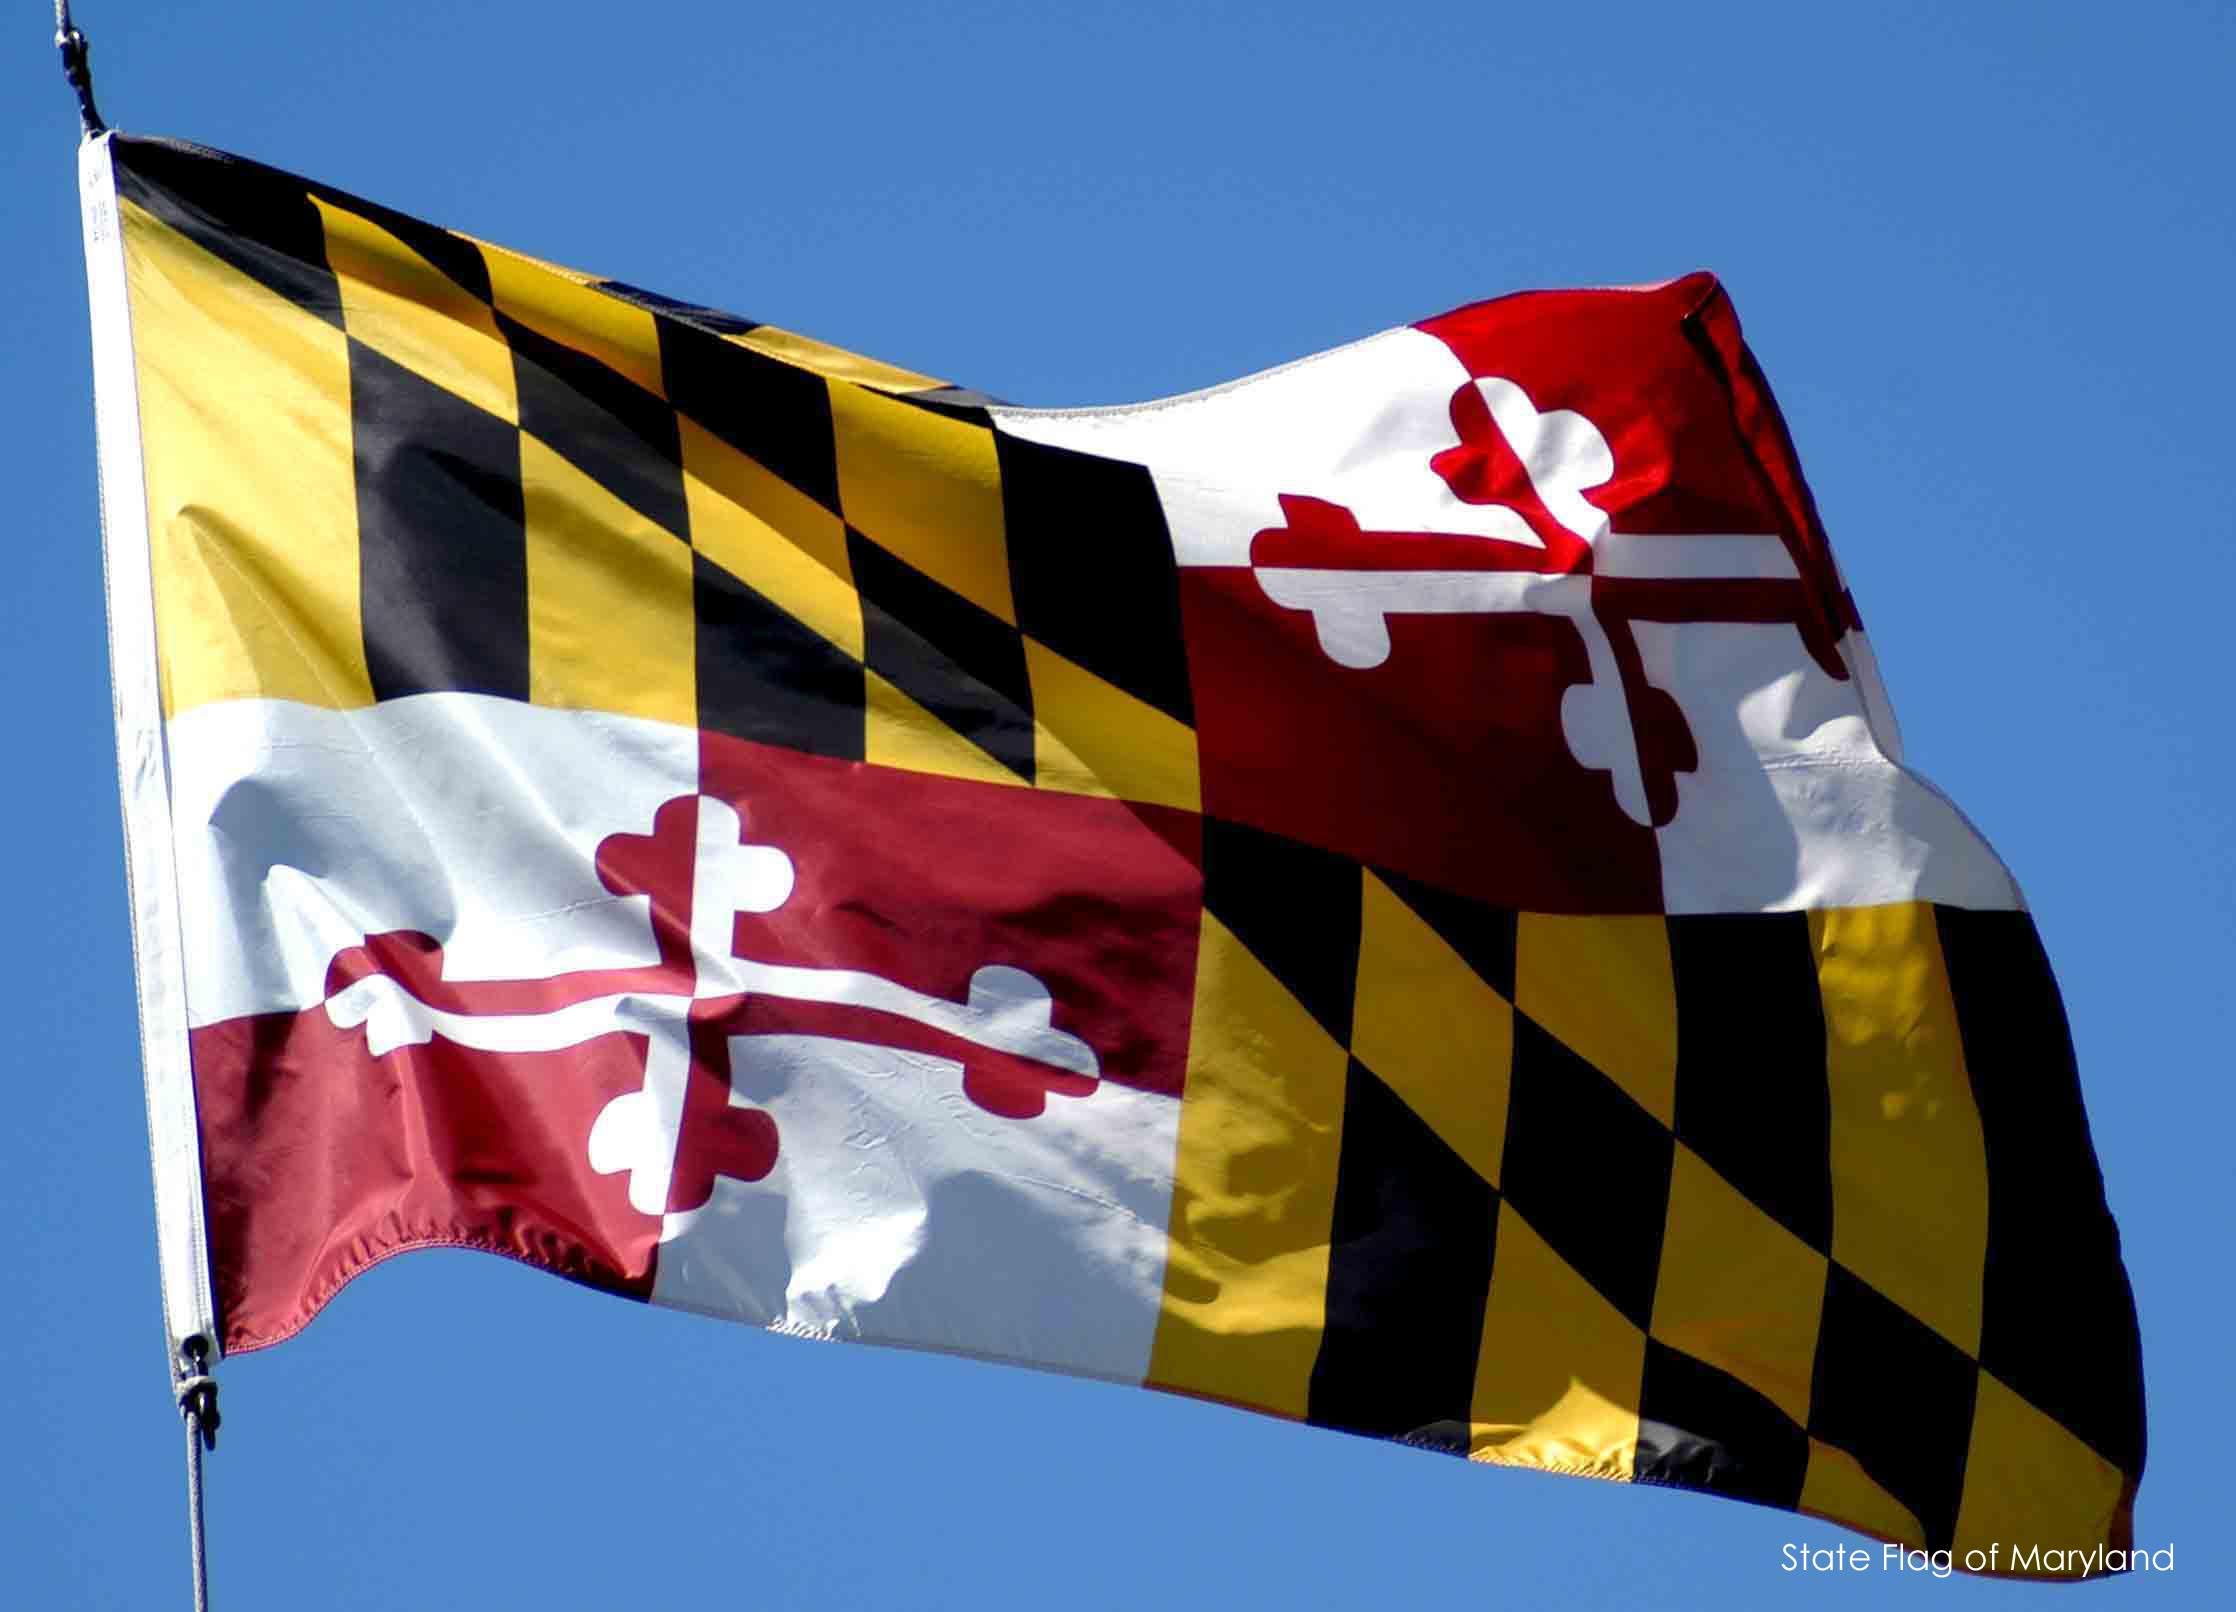 Will Ravens Wear Maryland-Themed Jerseys on TNF?